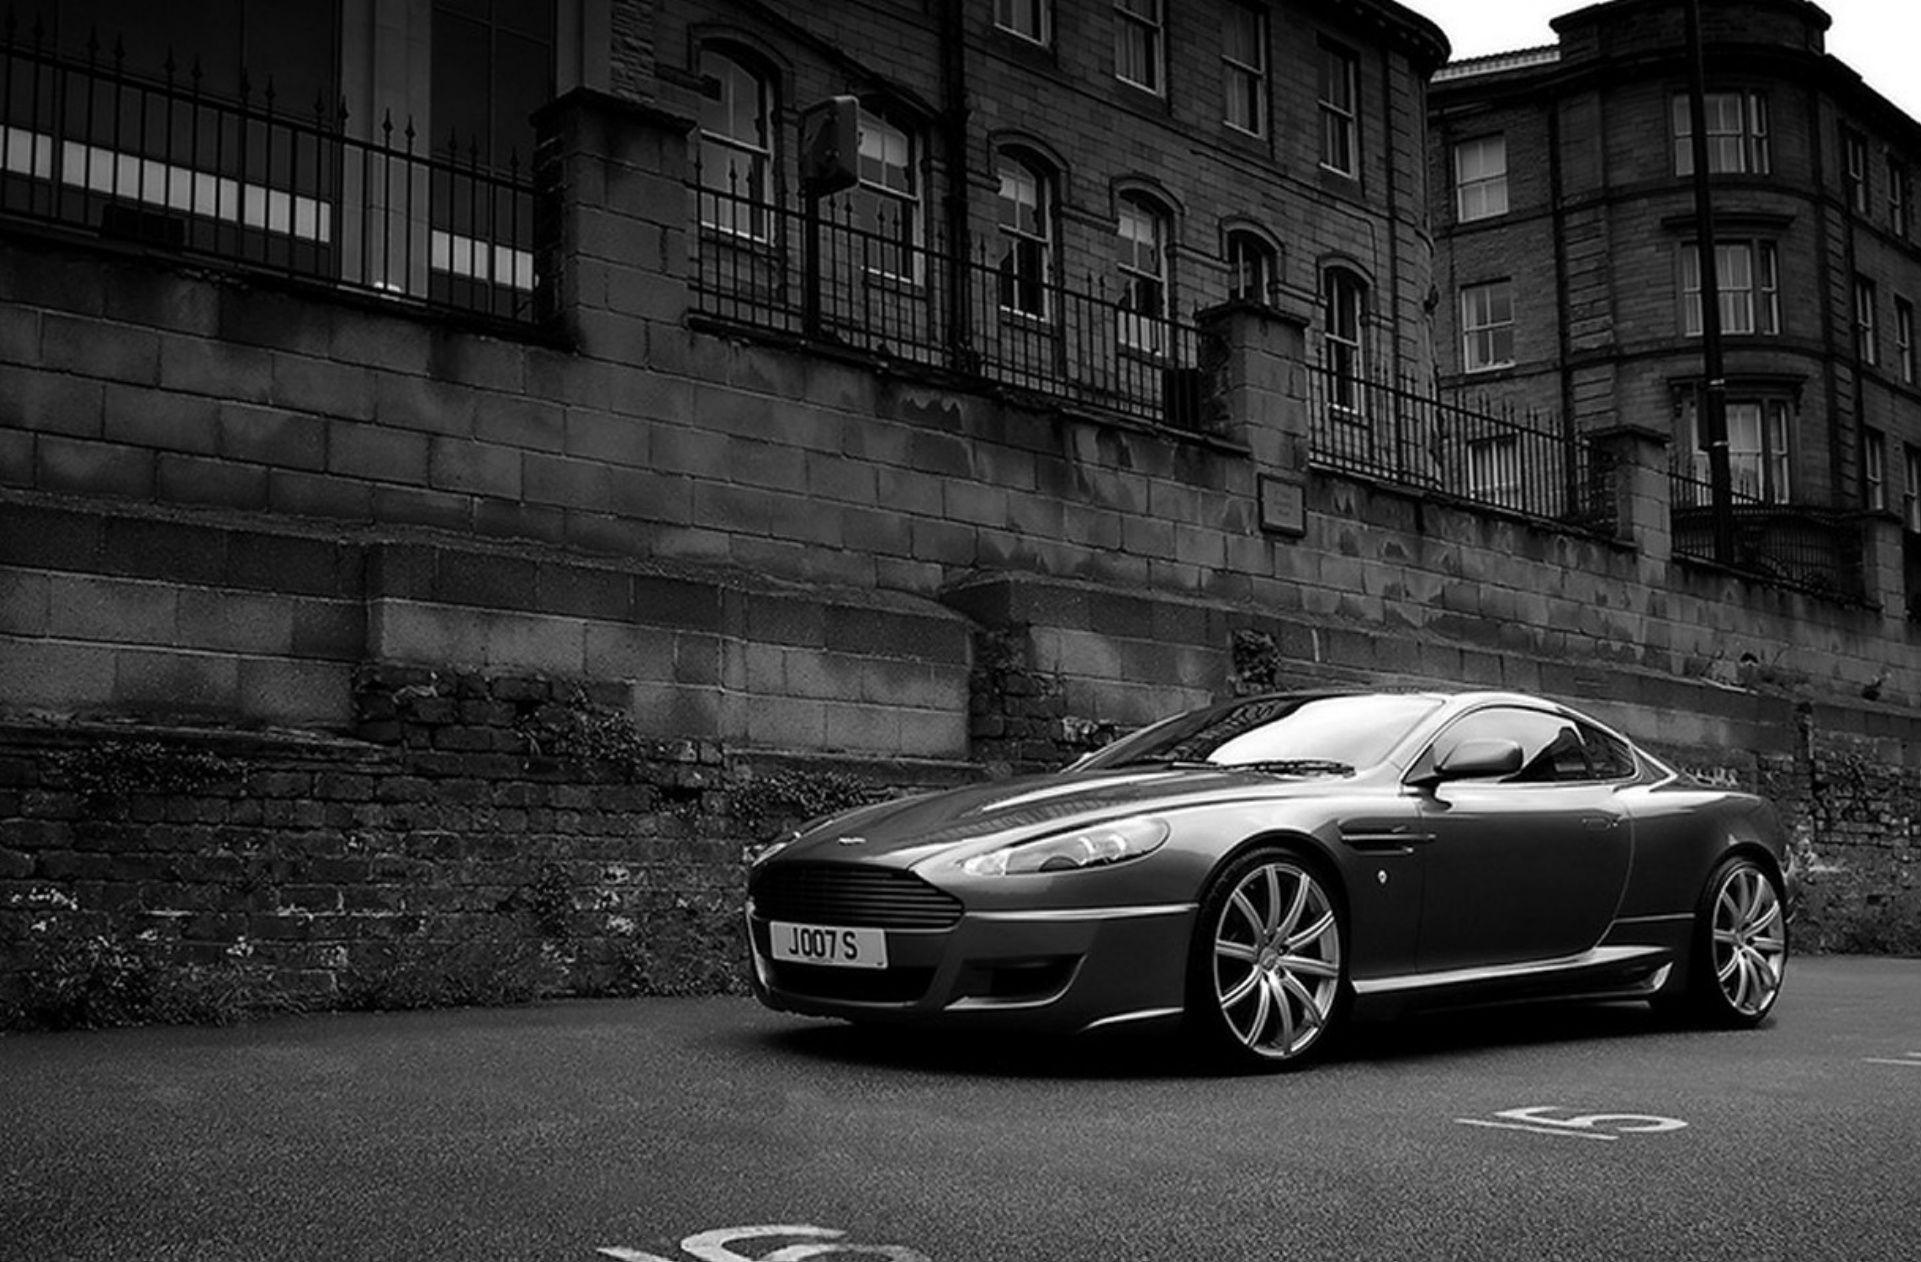 Aston Martin Wallpaper For Iphone #Vwk | Aston martin ...